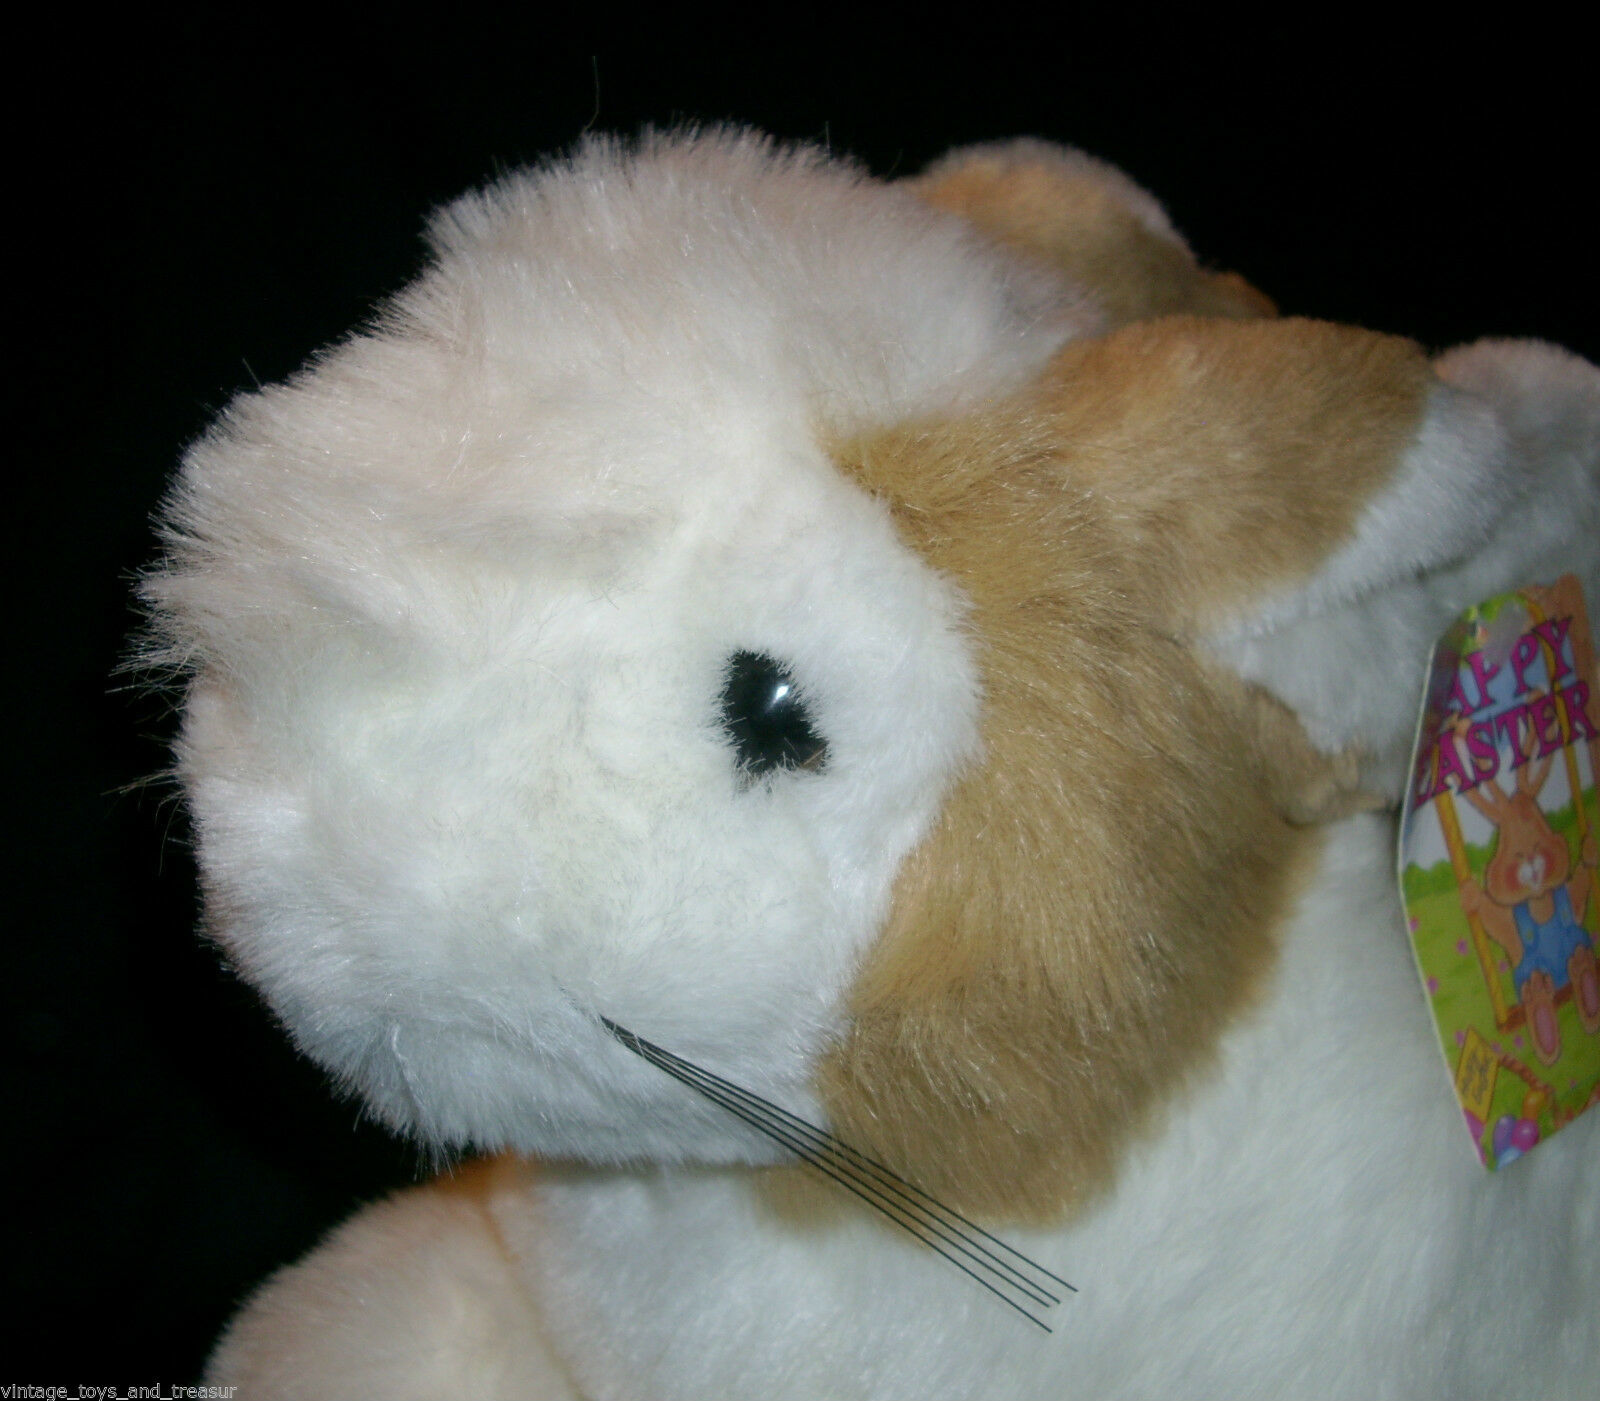 "14"" VINTAGE COMMONWEALTH WHITE TAN EASTER BUNNY RABBIT STUFFED ANIMAL PLUSH TOY"